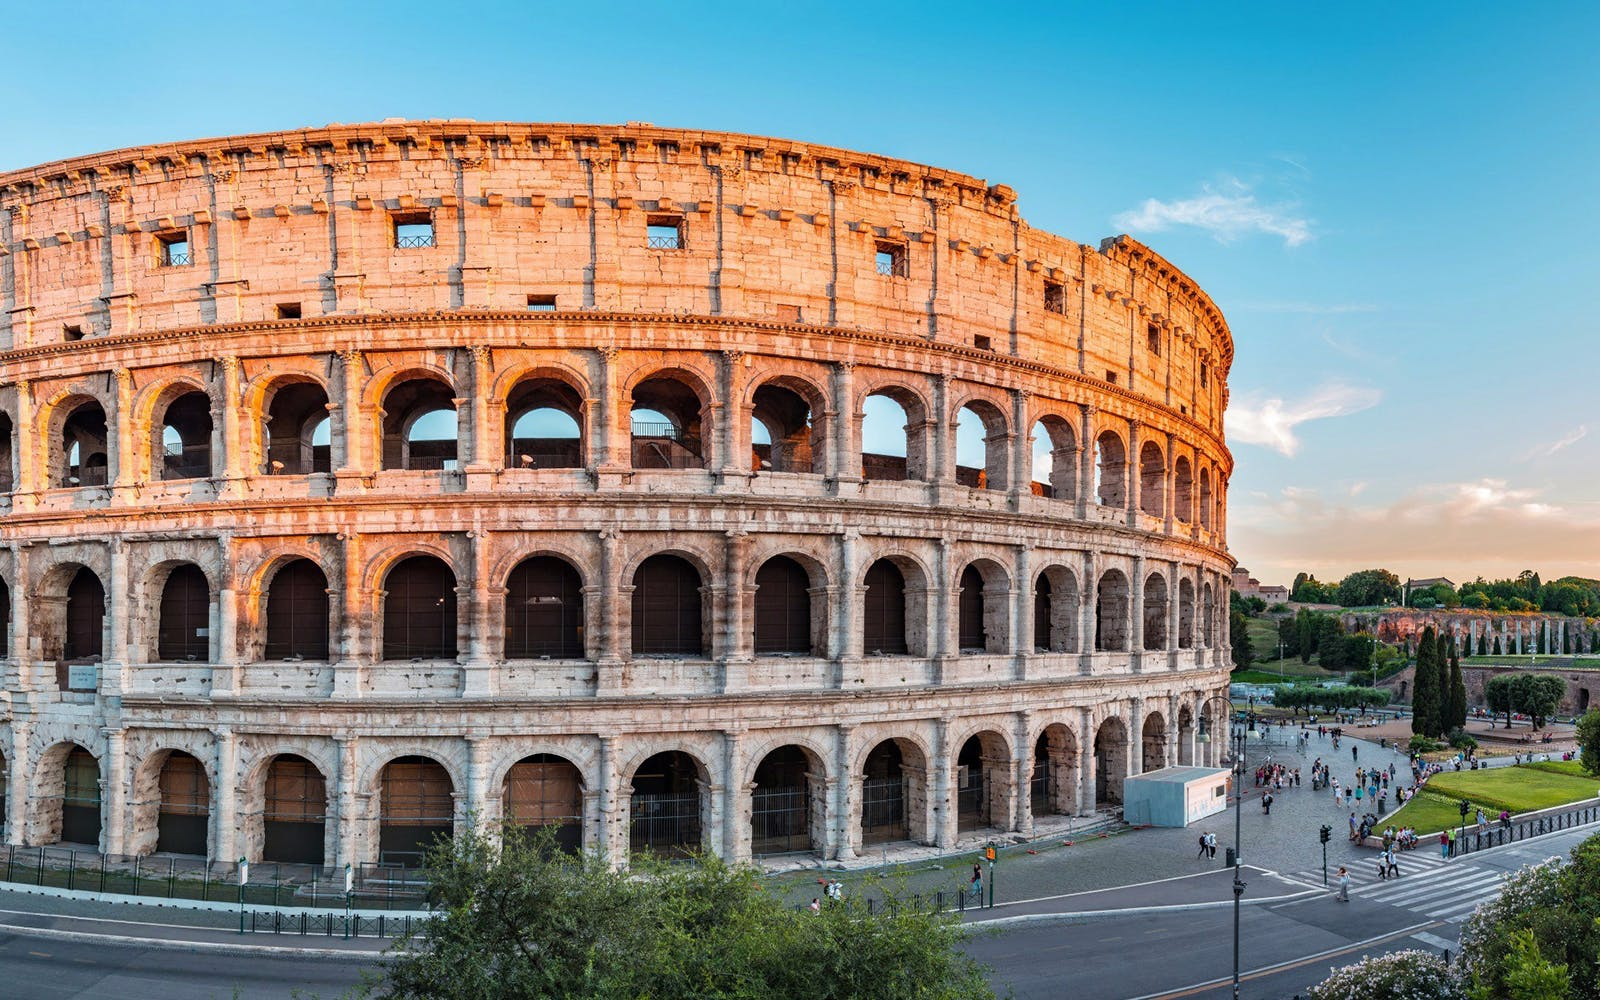 skip the line Colosseum tickets